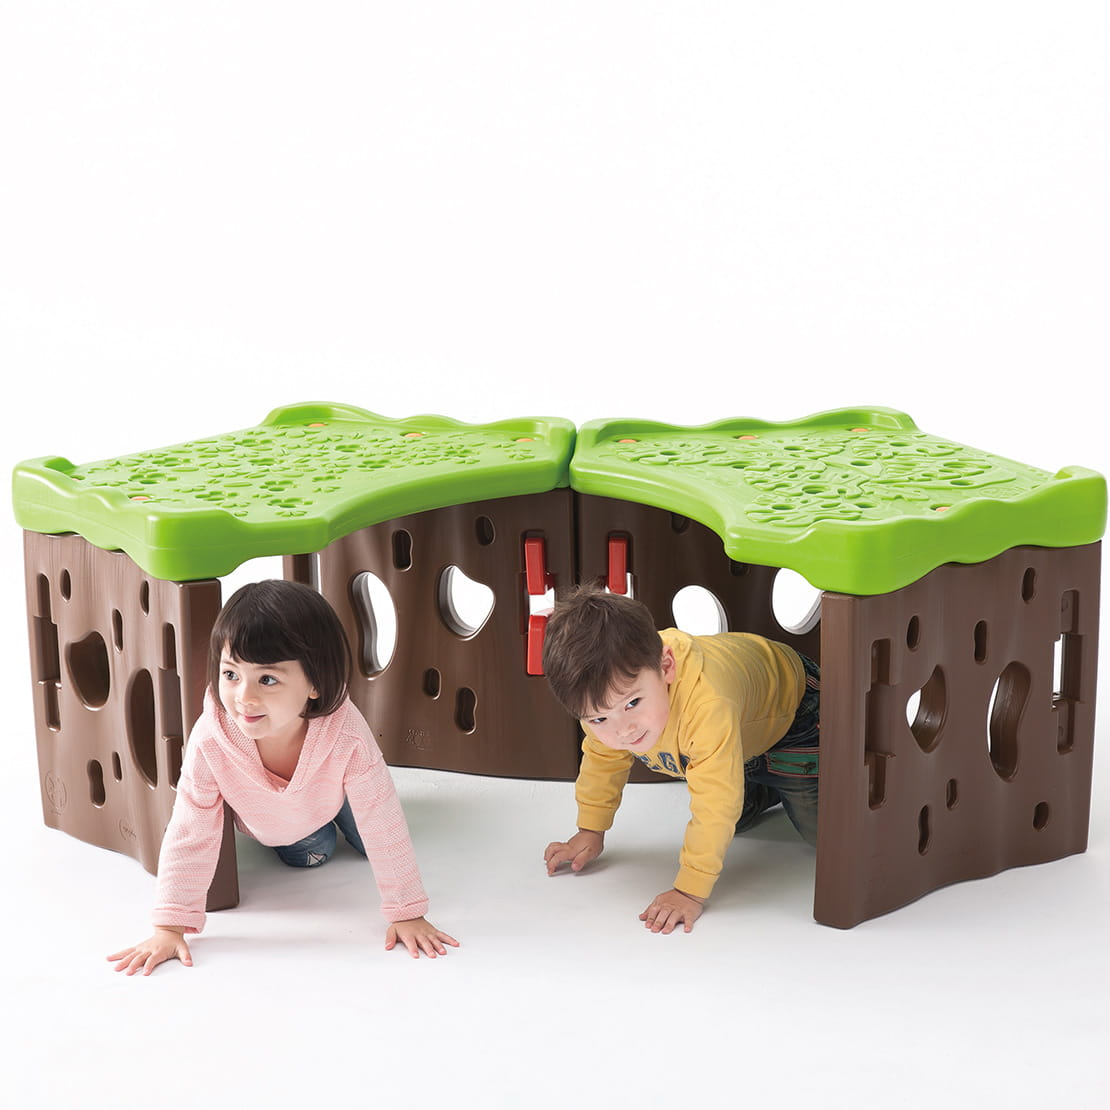 【Weplay】 玩轉樹洞 2